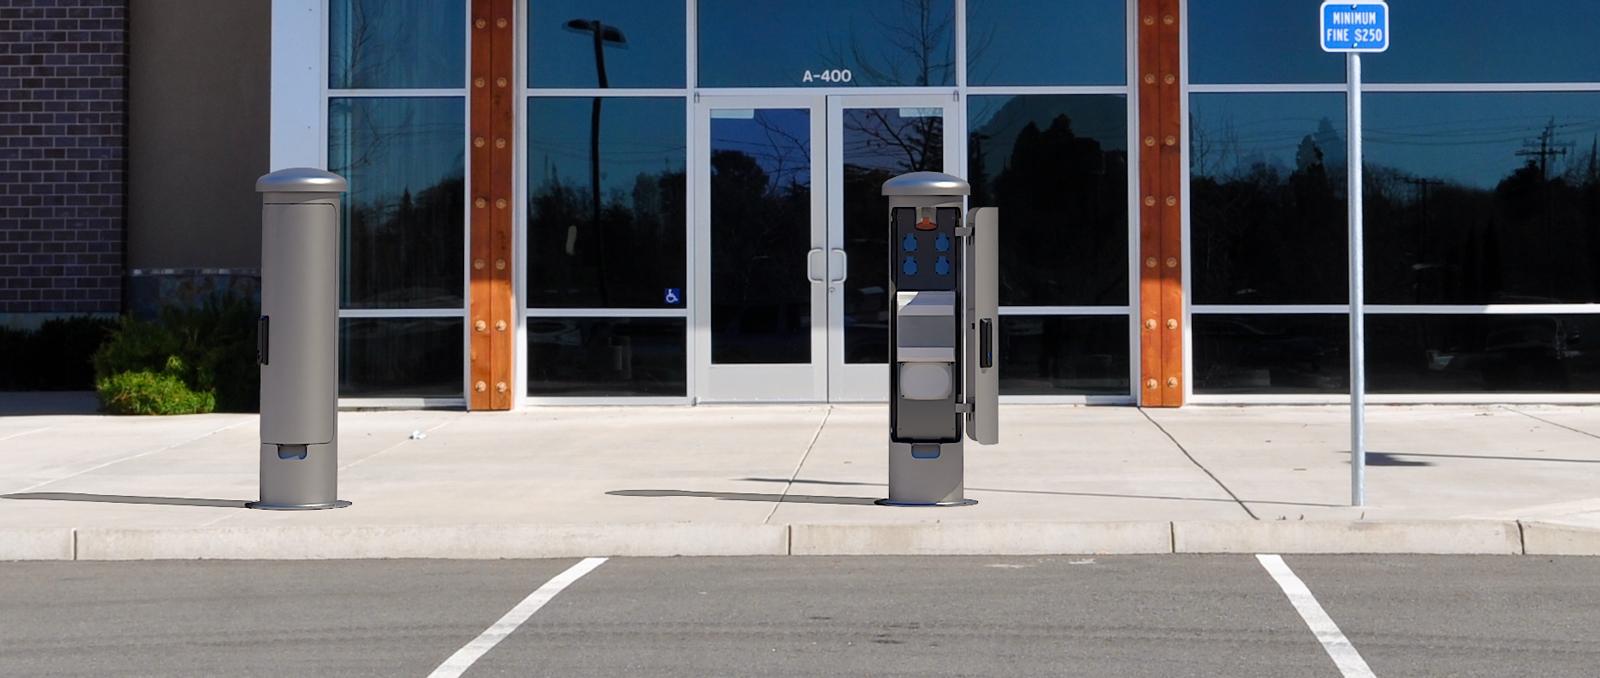 ESP14-socket pillar power distribution column At the parking lot-1600×678